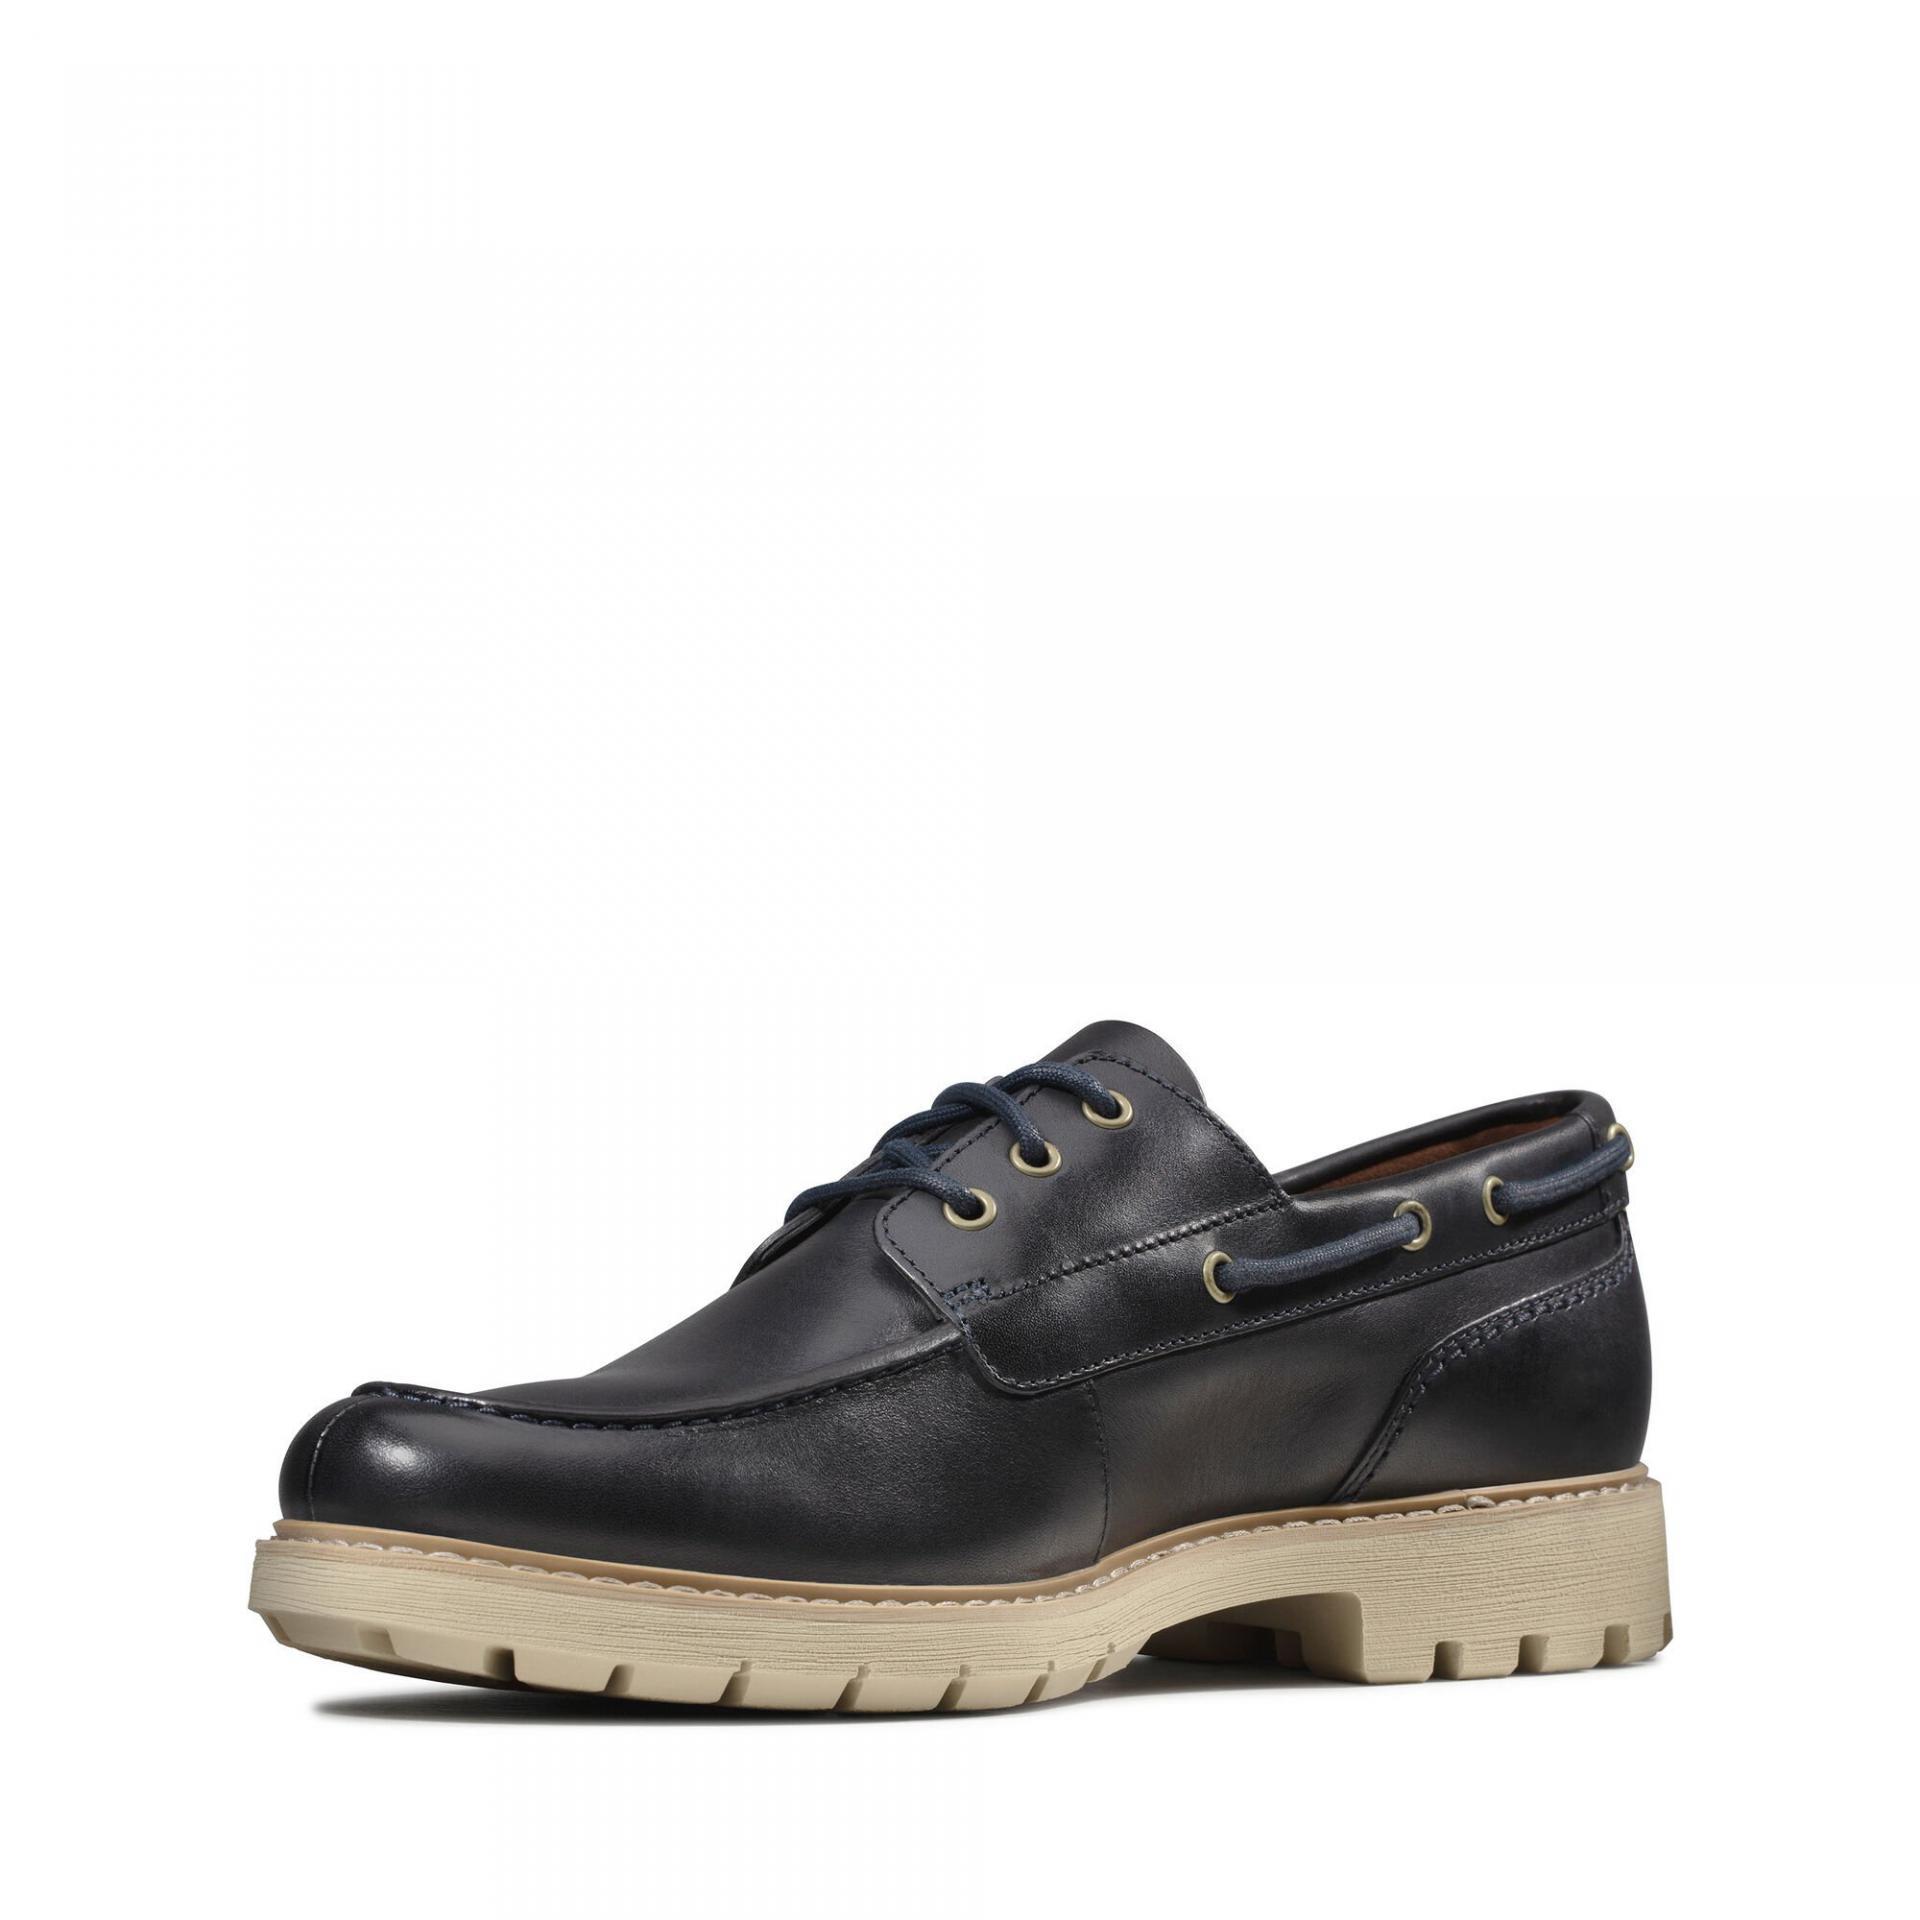 Clarks Men's Batcombe Sail Shoes Various Colours 5050410169427 - 8 UK Navy